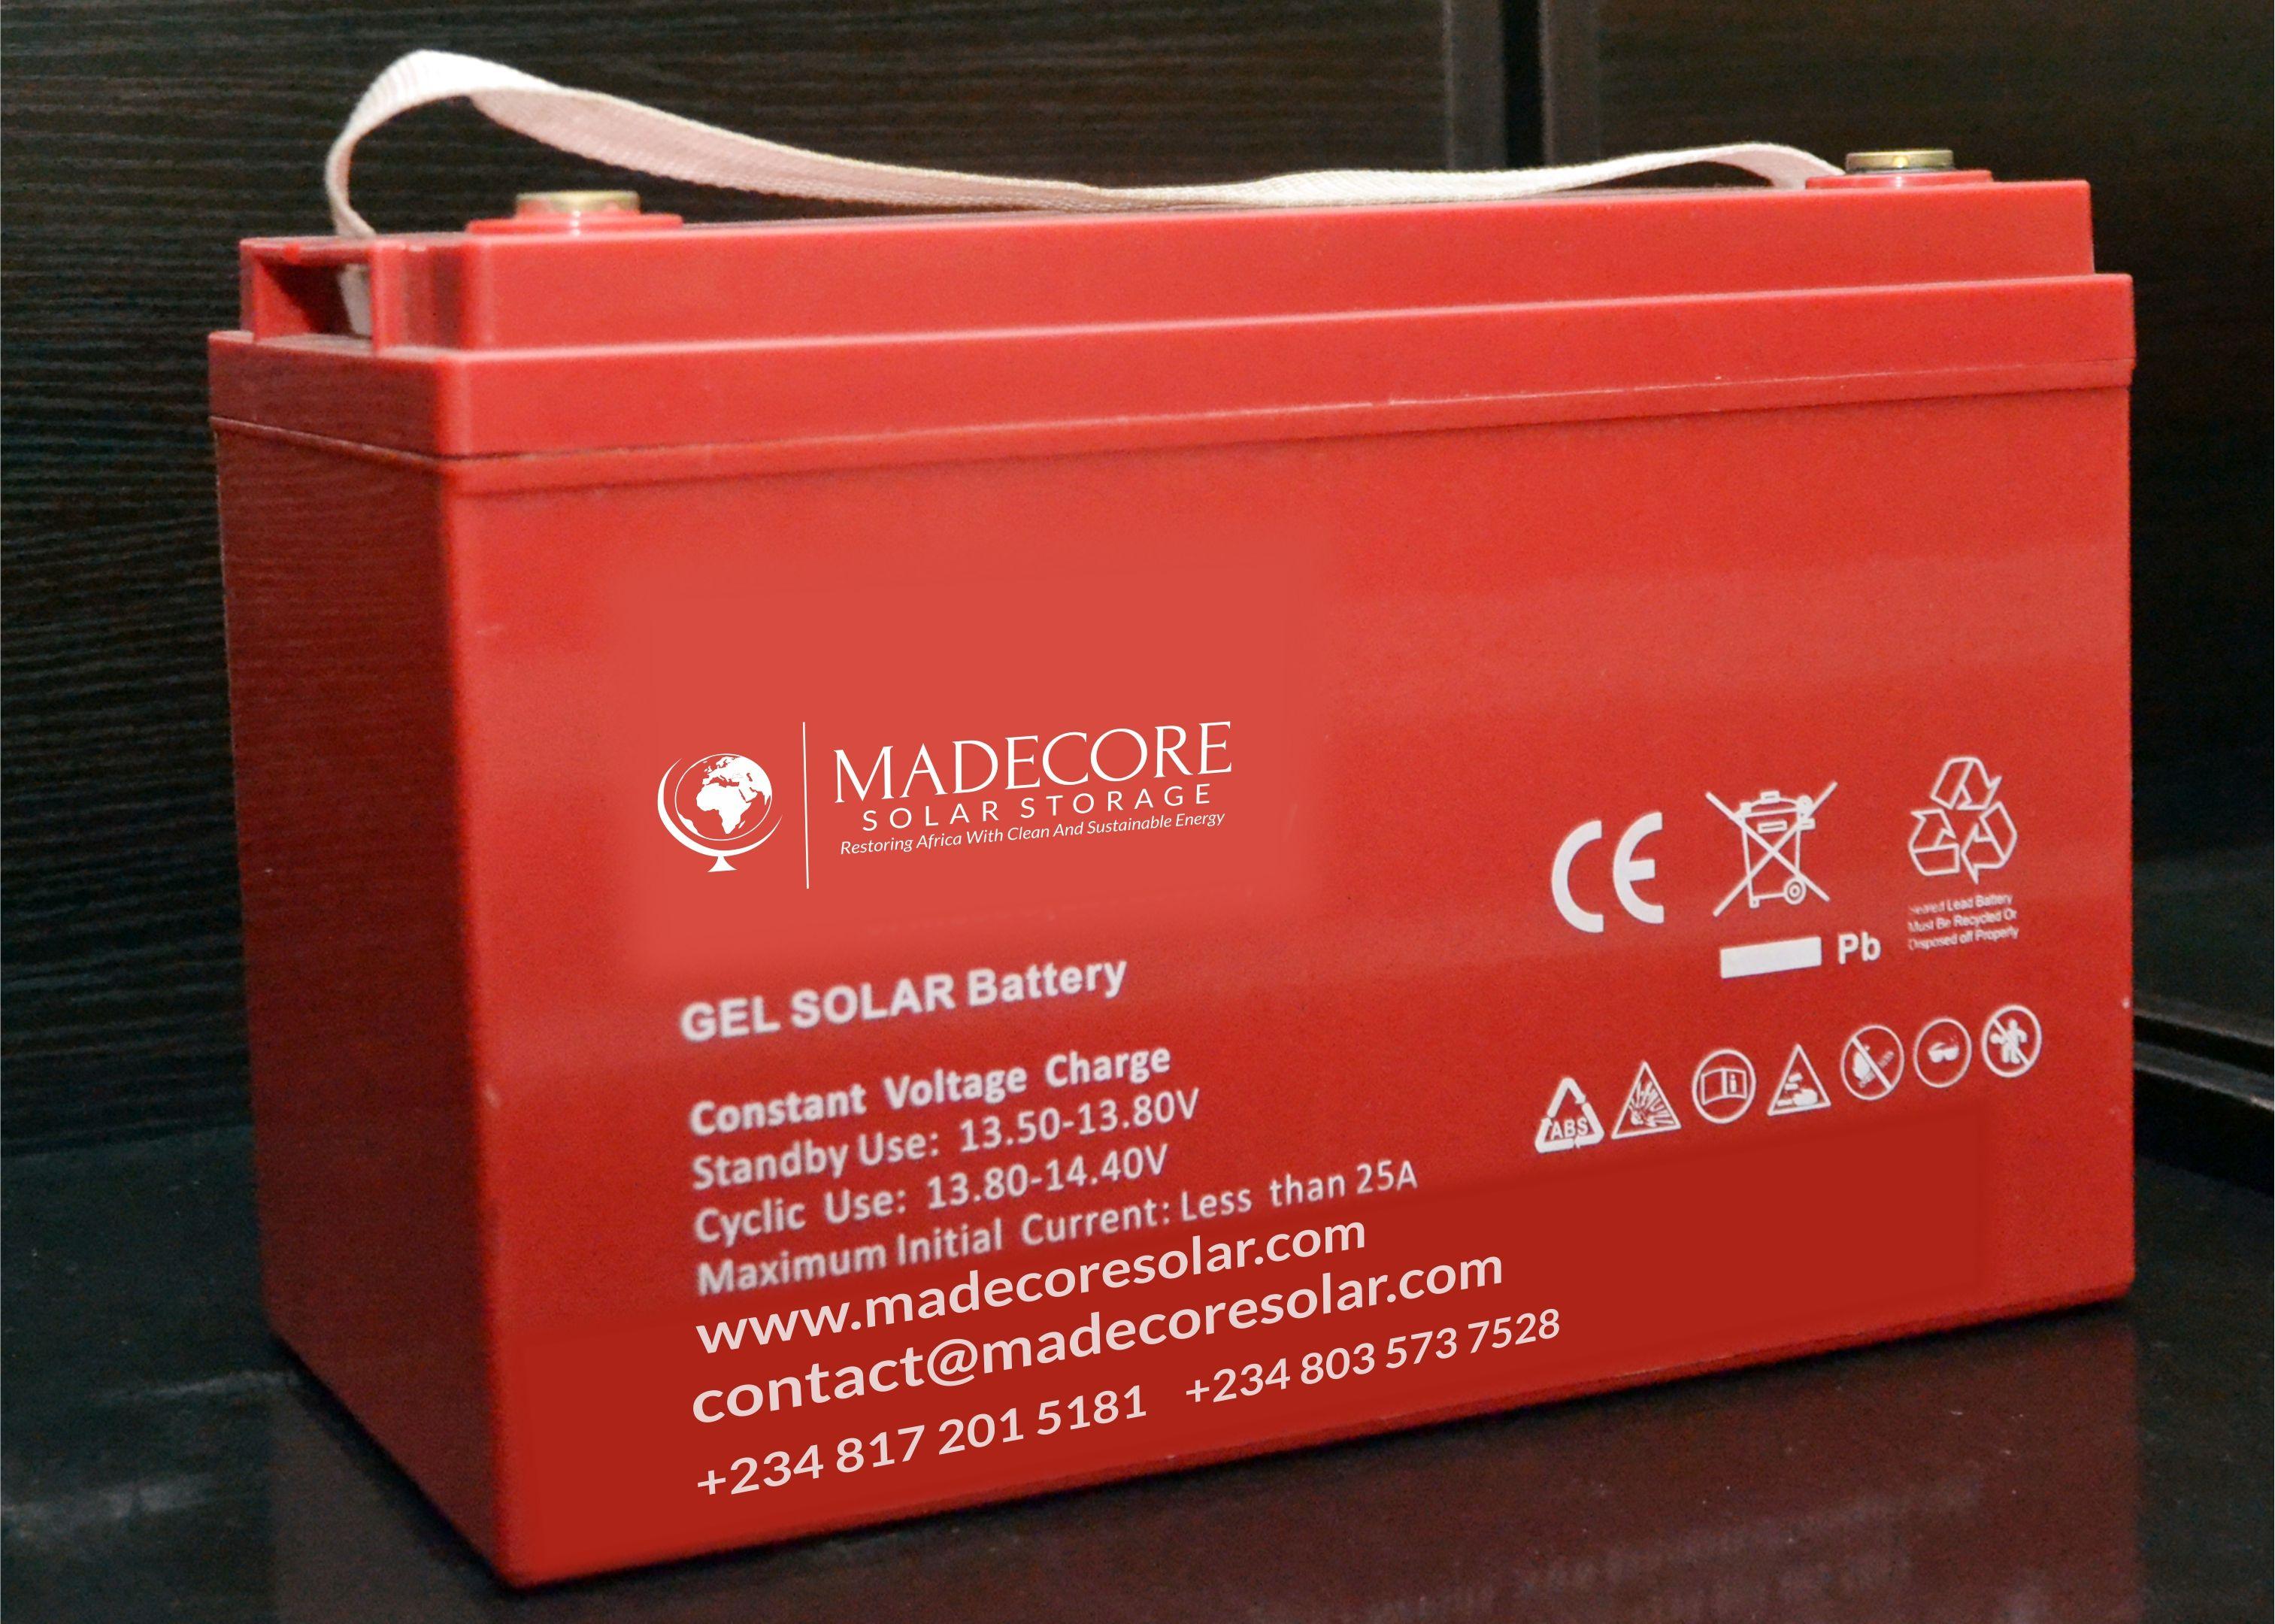 MADECORE-Storage-Battery-2-compressor